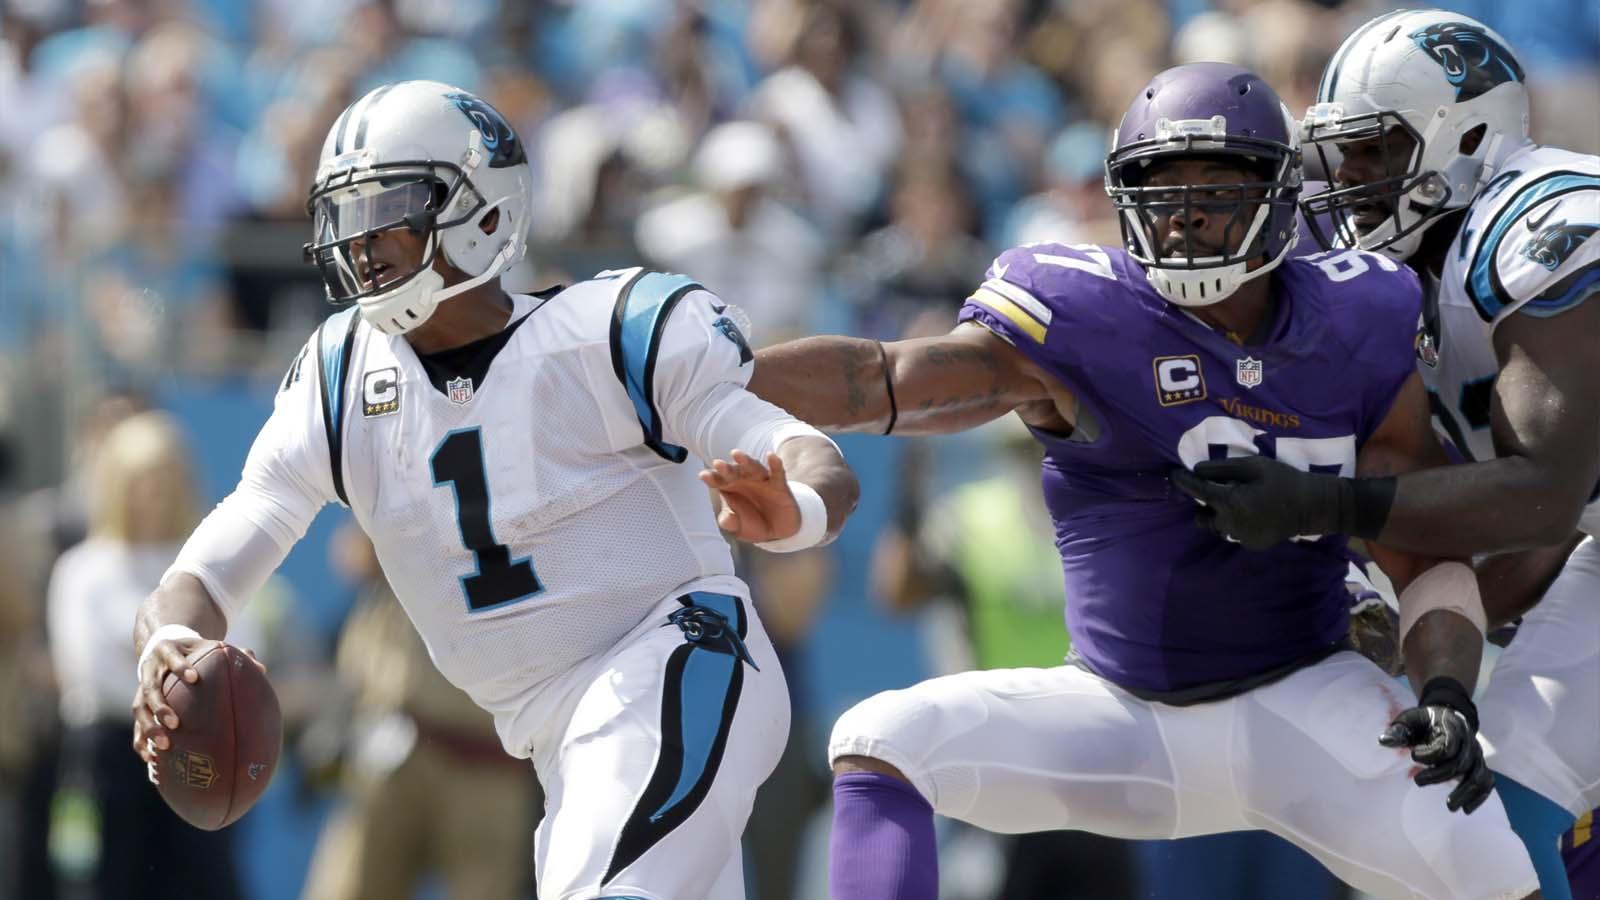 Vikings defense shuts down Newton for win in Carolina